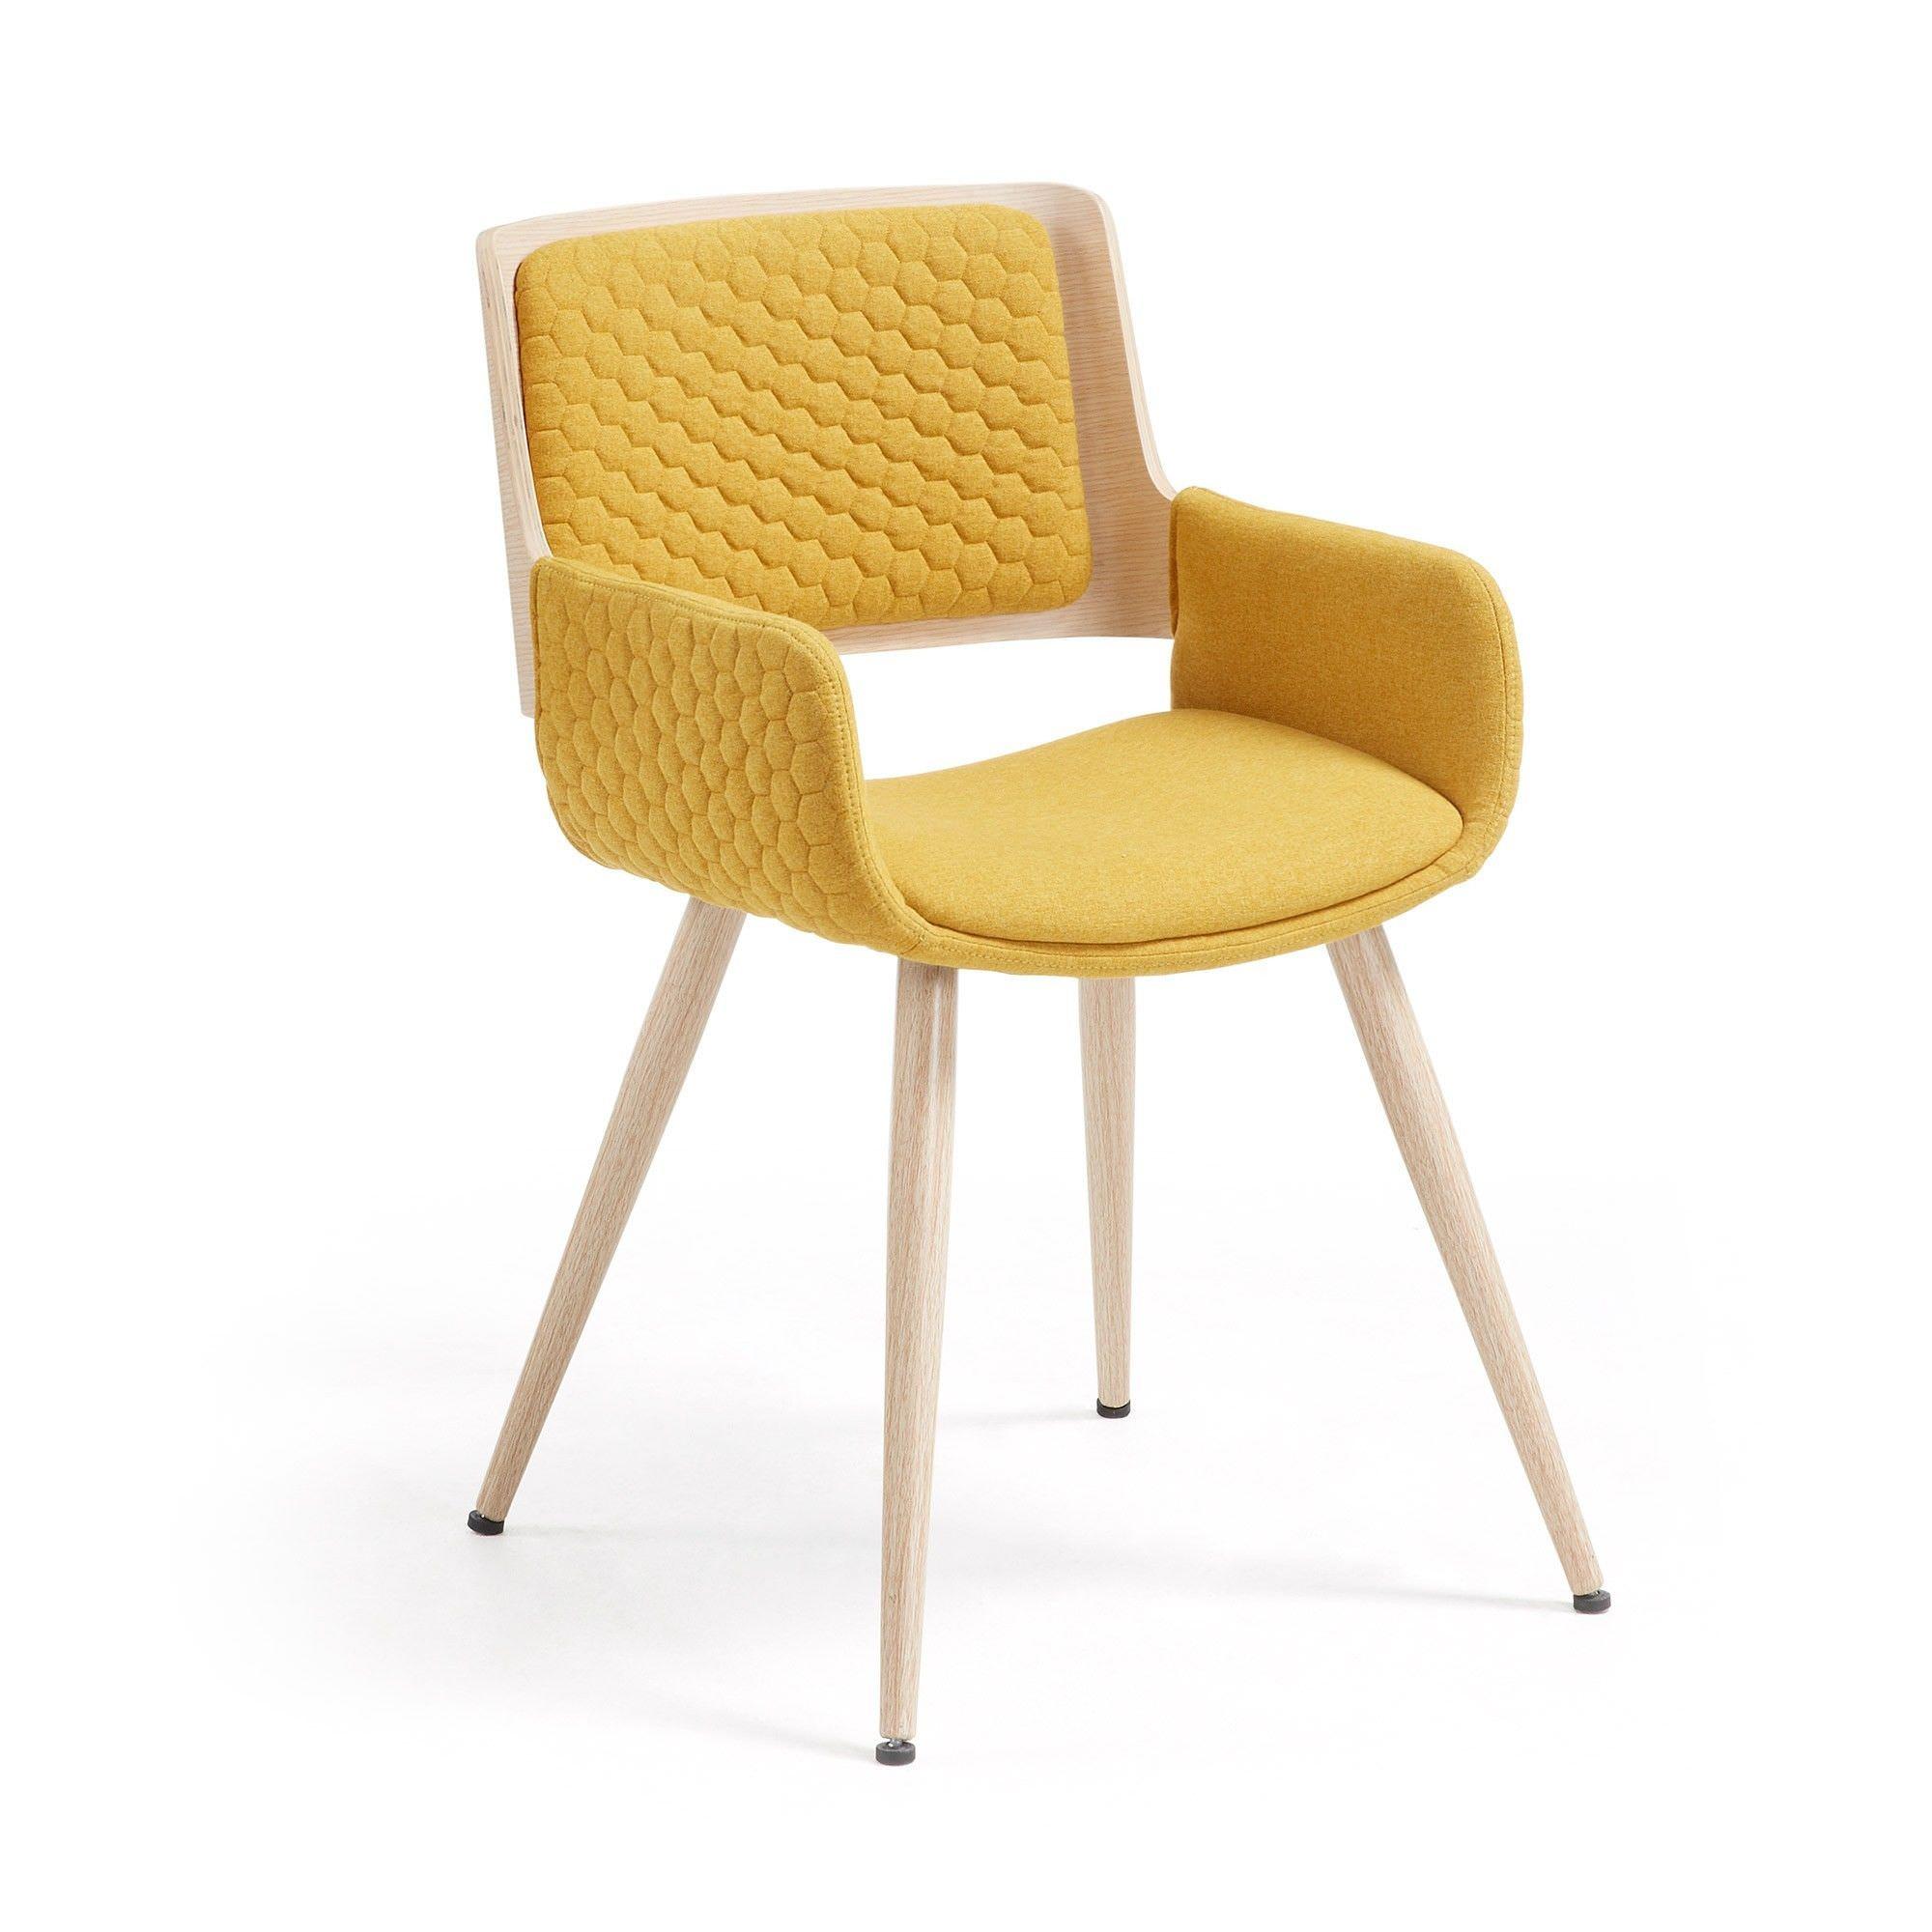 Mora Fabric & Wood Dining Armchair, Mustard